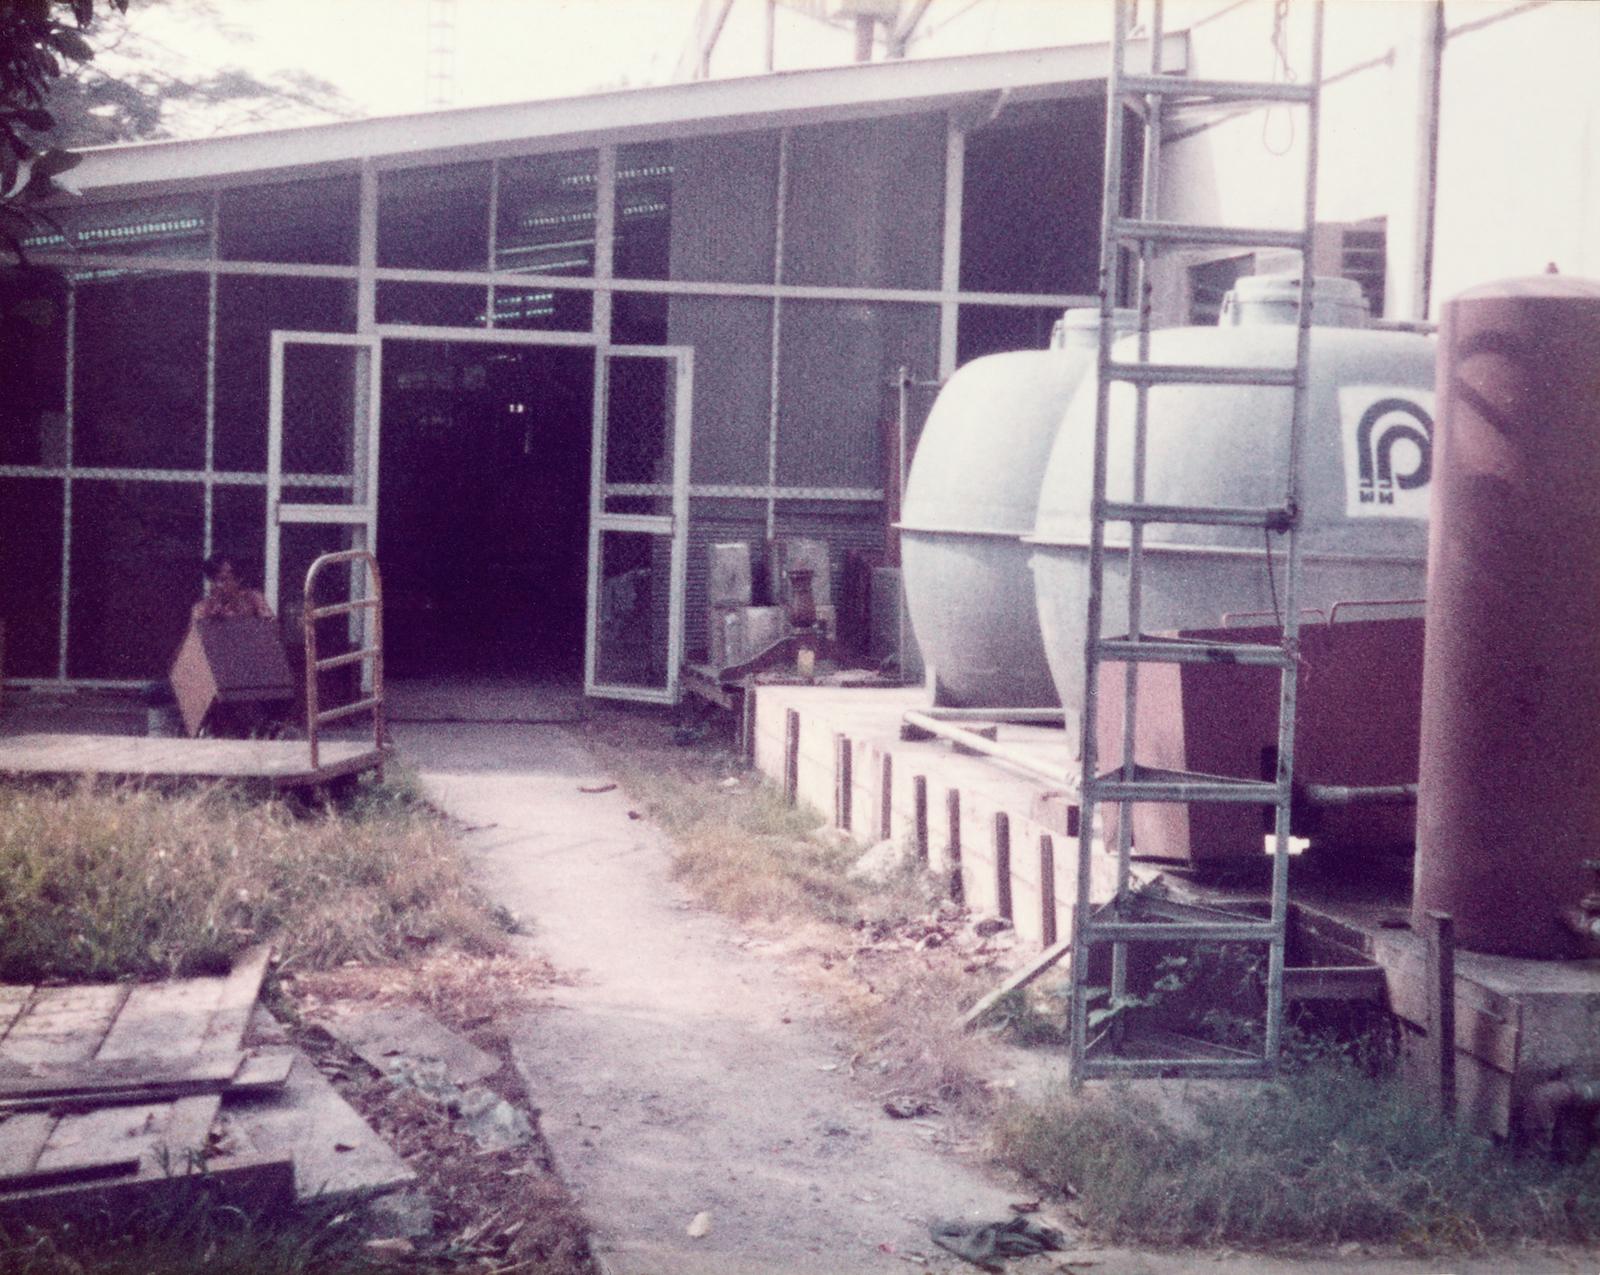 Bangkok - Warehouse - 1984